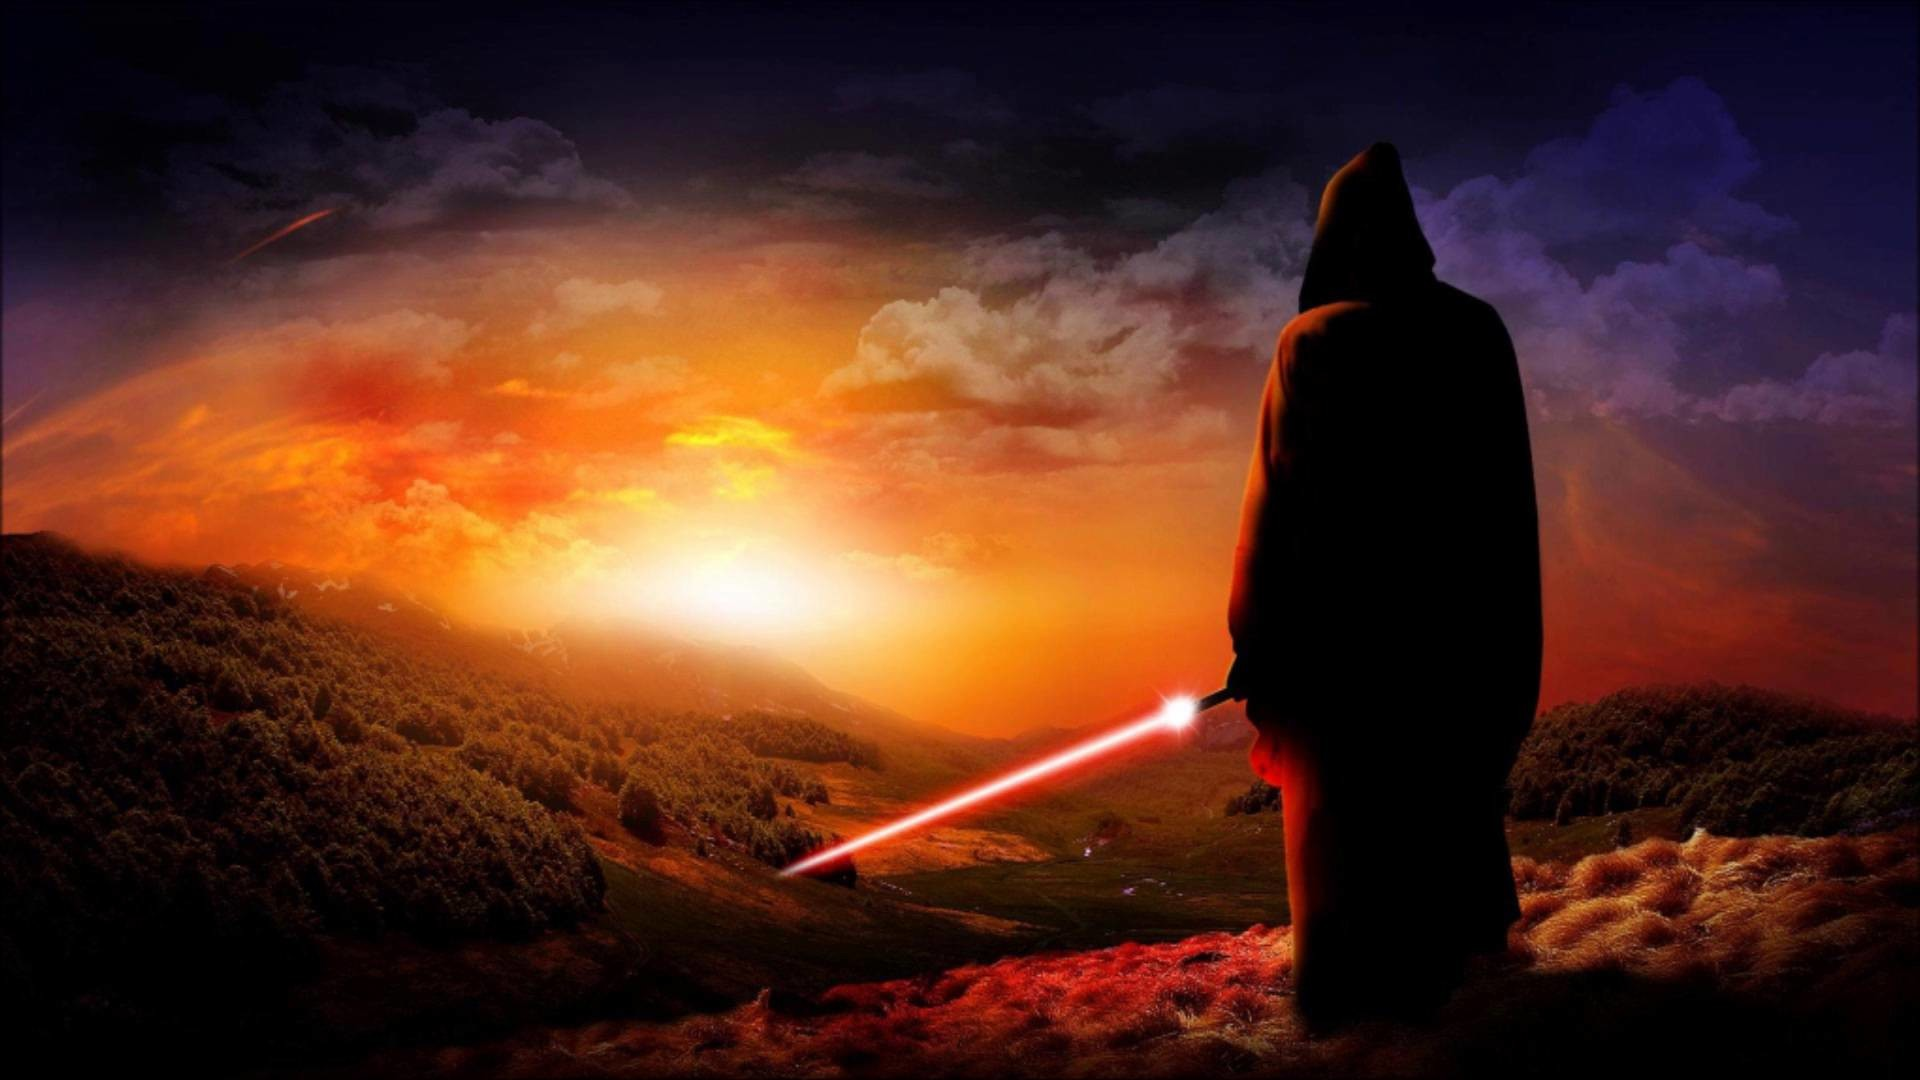 John Williams – Anakin's Betrayal (Star Wars Soundtrack) [HD] – YouTube